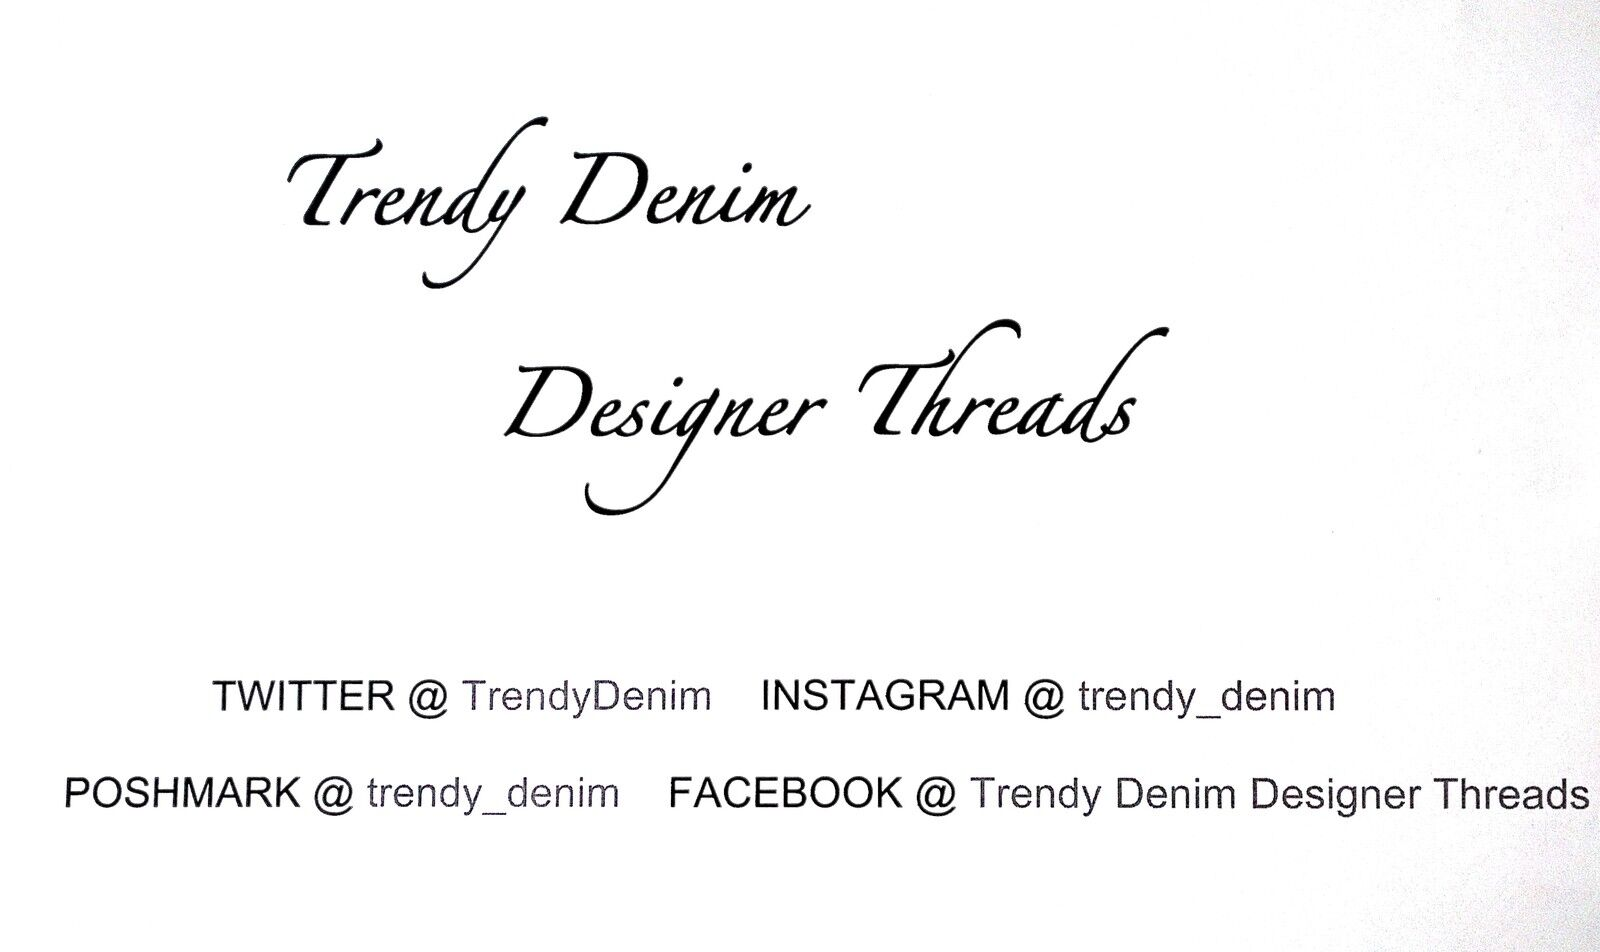 Trendy Denim Designer Threads